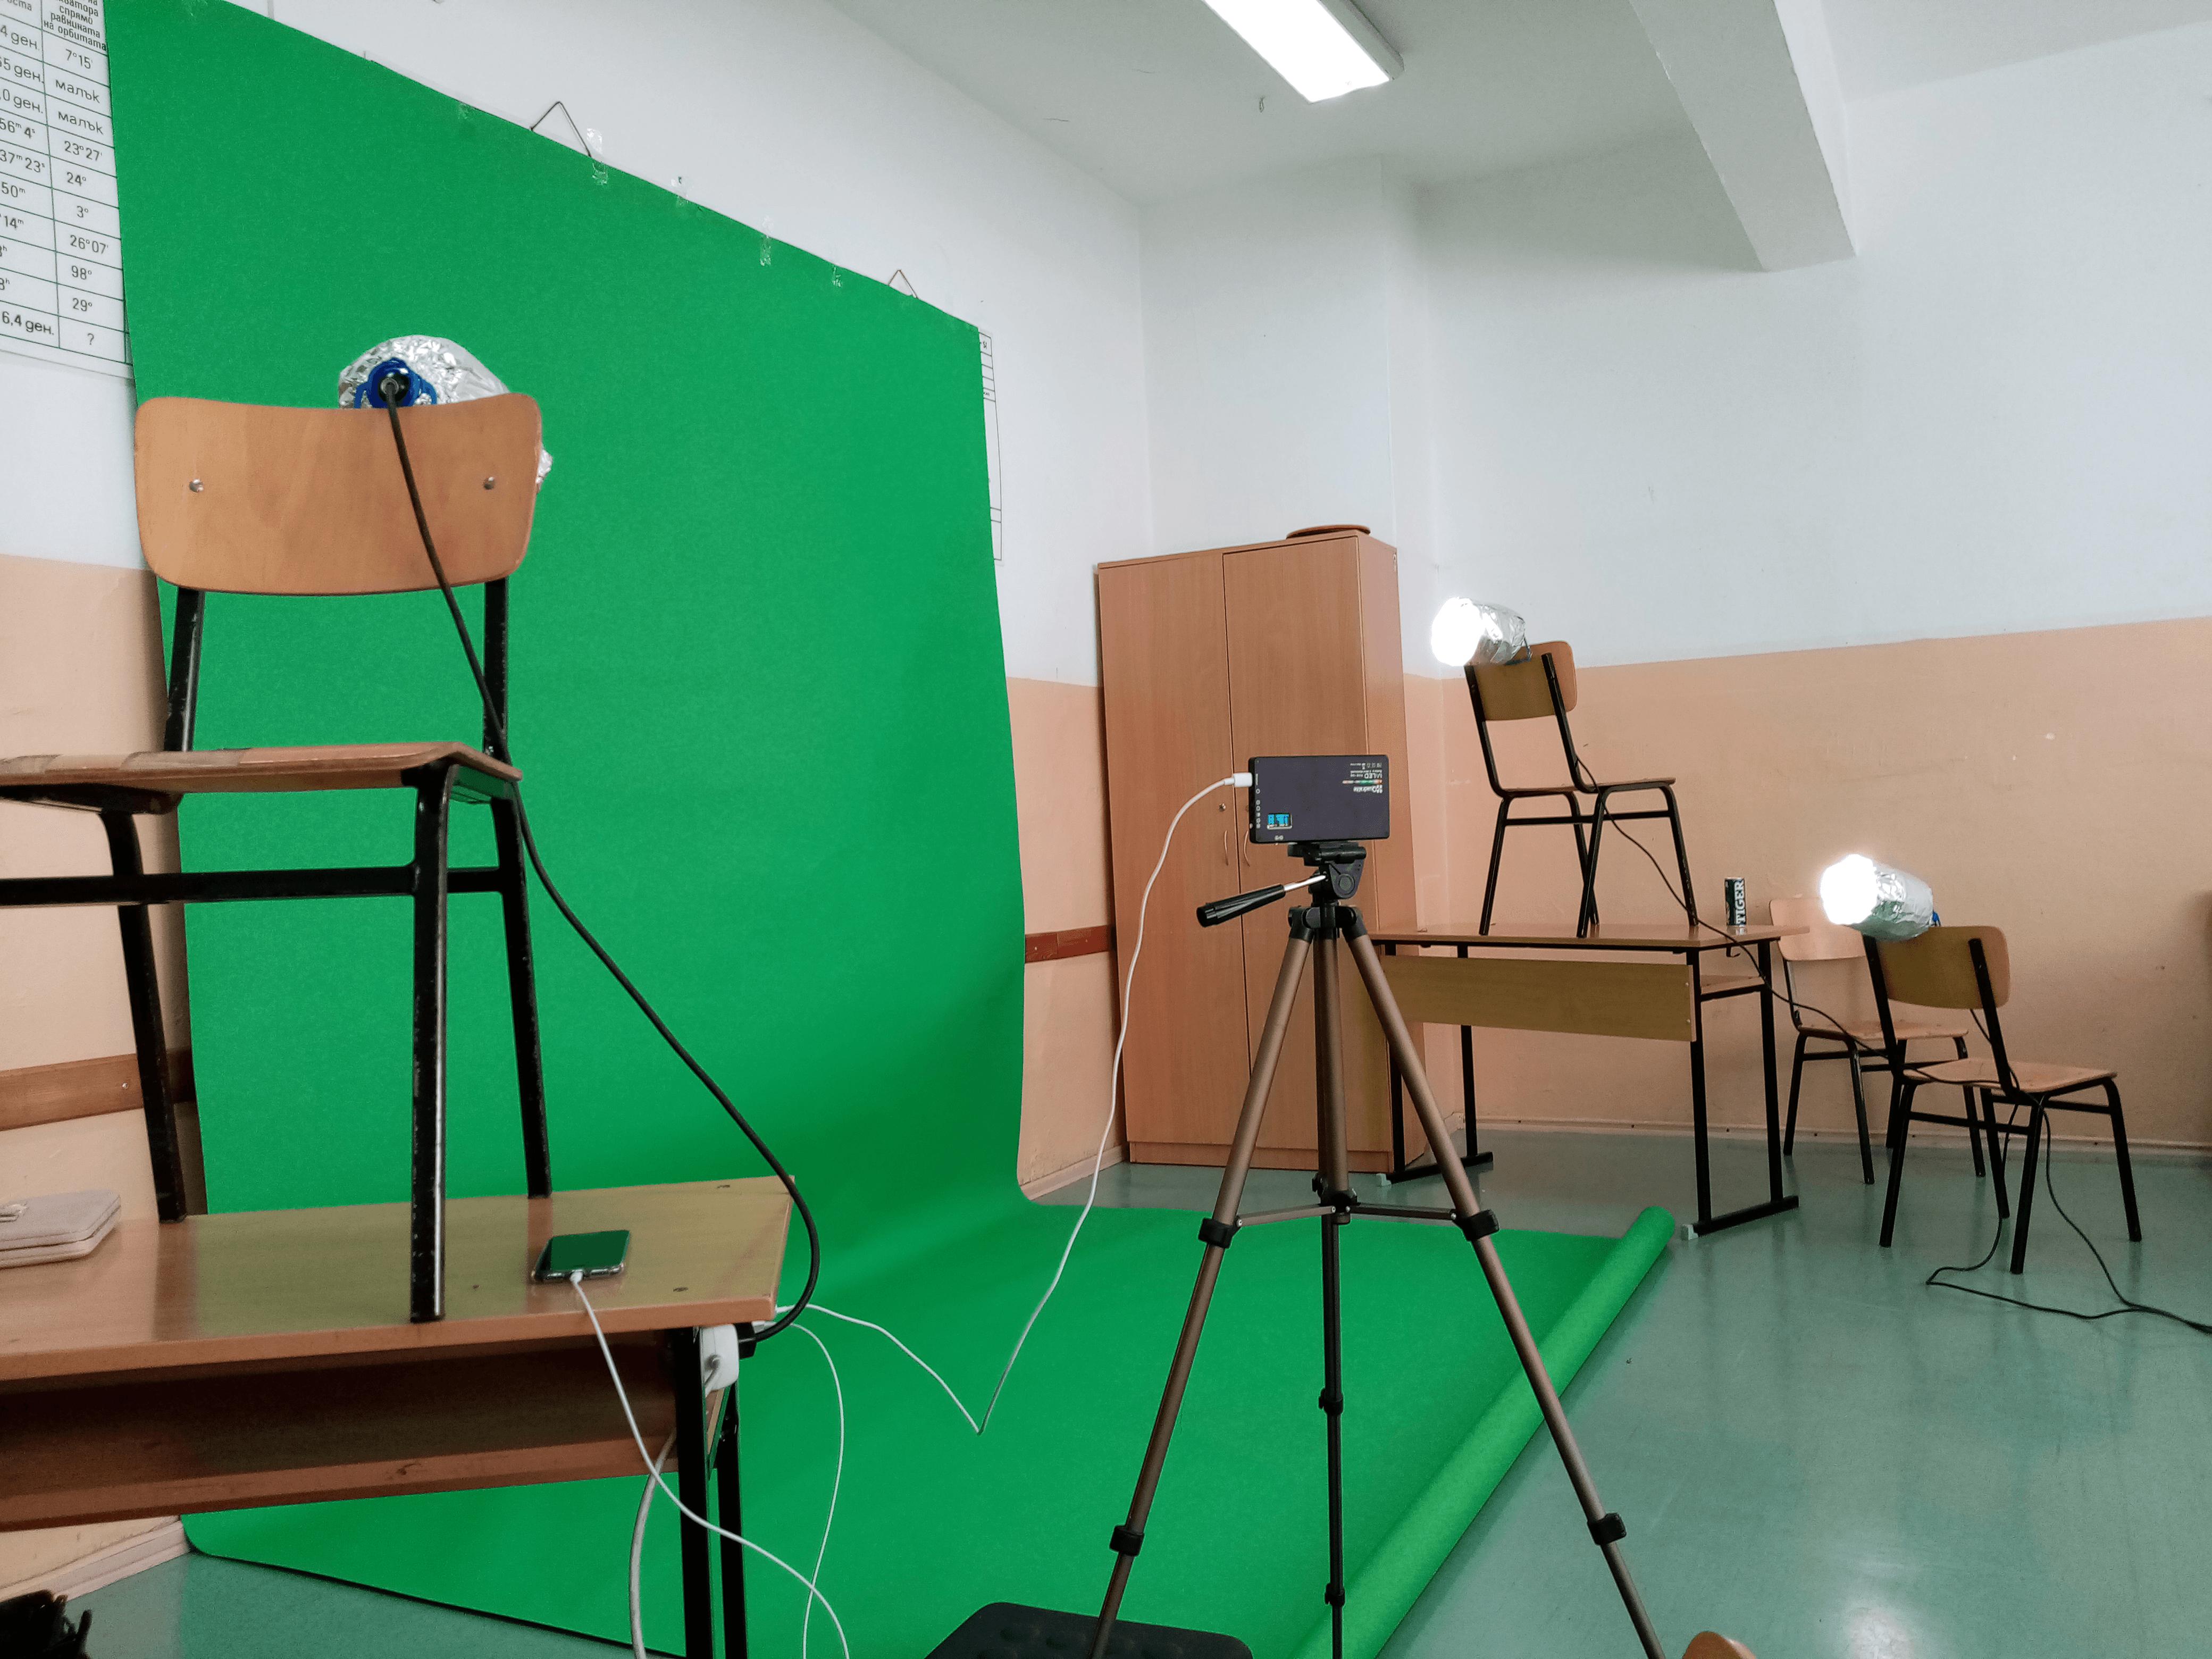 Slide 1 - ППМГ ТВ Сливен - Един ден на снимачната площадка